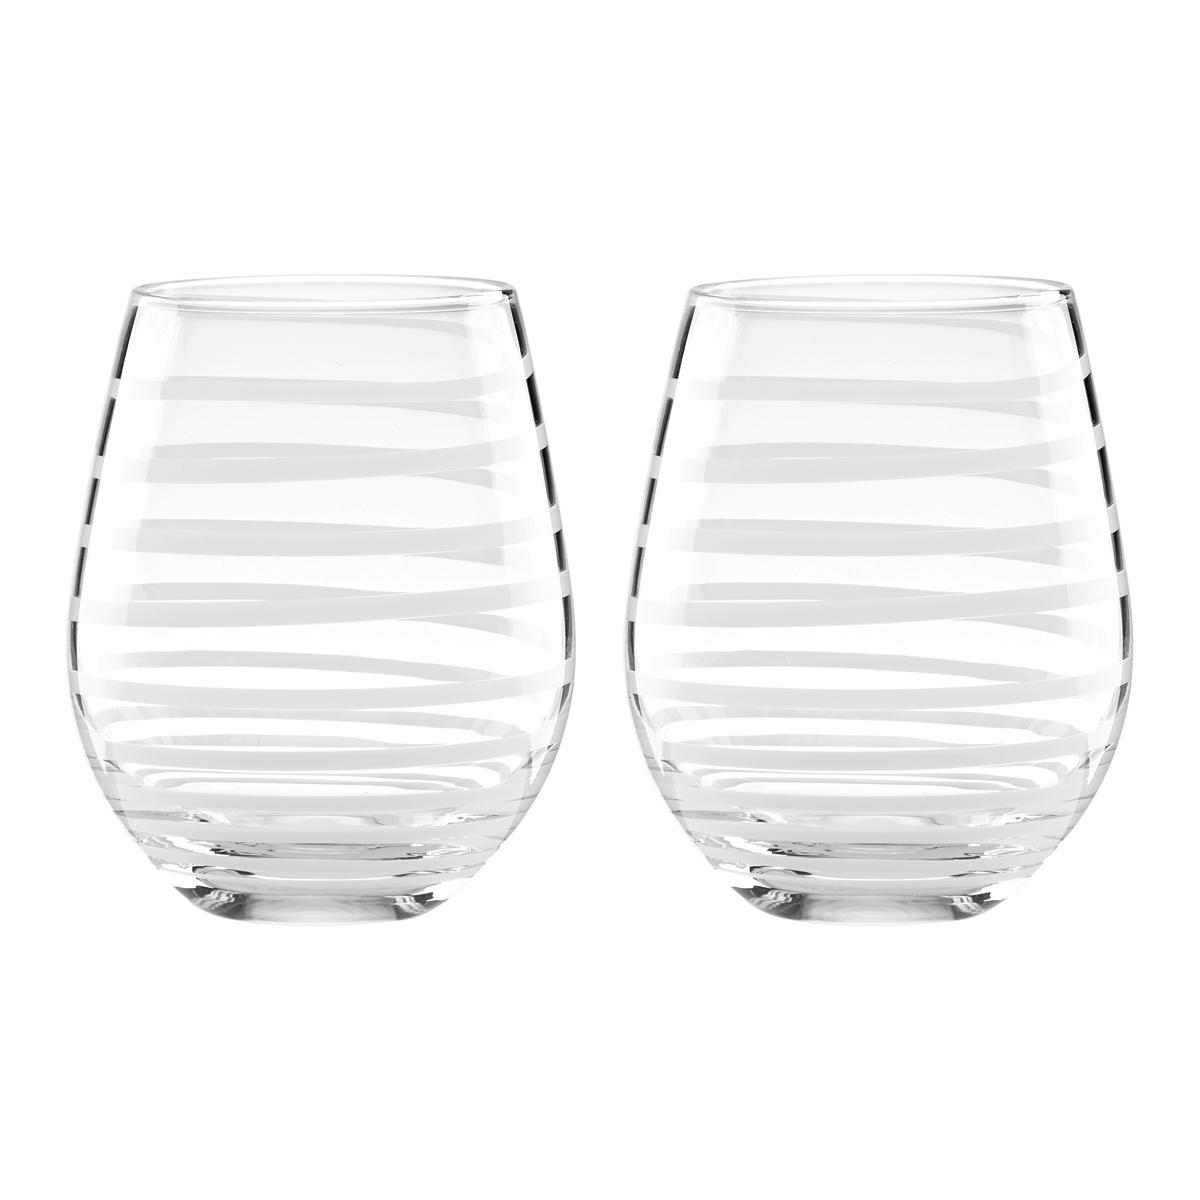 Kate Spade New York, Lenox Charlotte St White Stemless Wine Pair